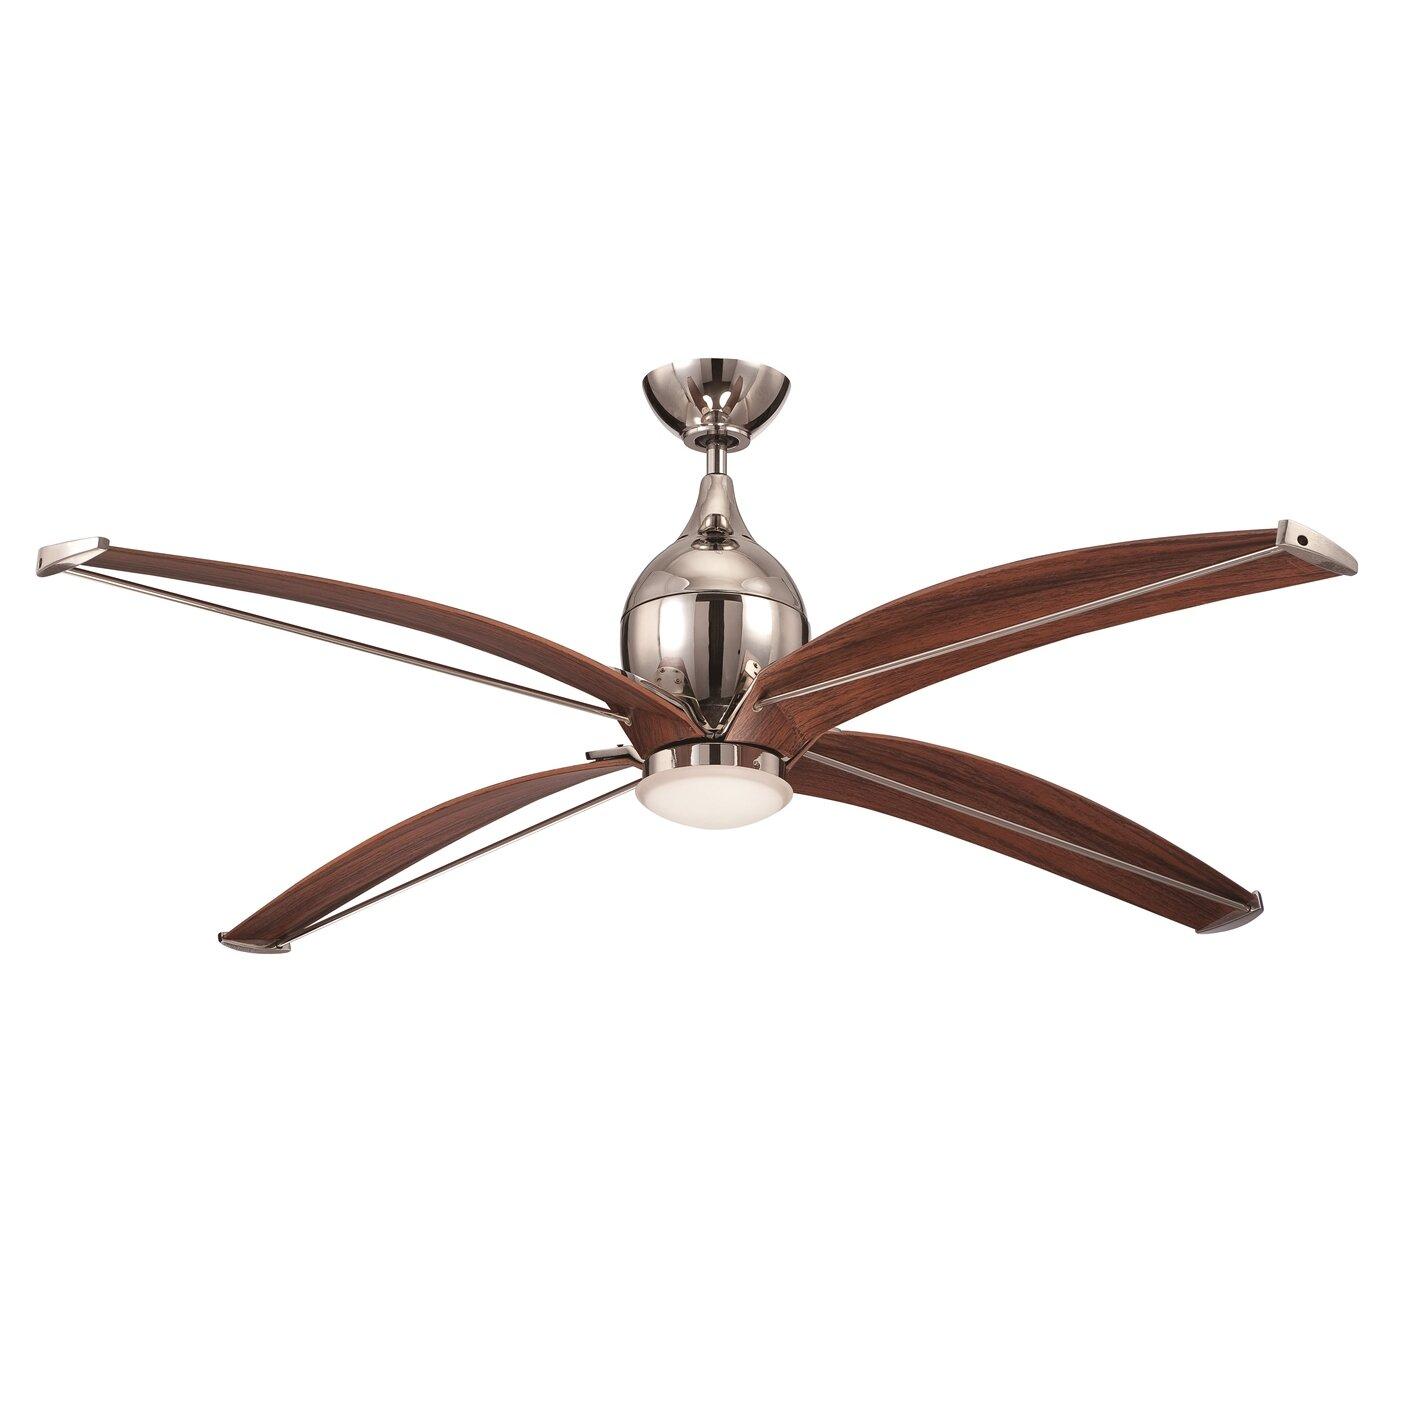 "Ellington 60"" Tyrod 4 Blade Ceiling Fan With Wall Remote"